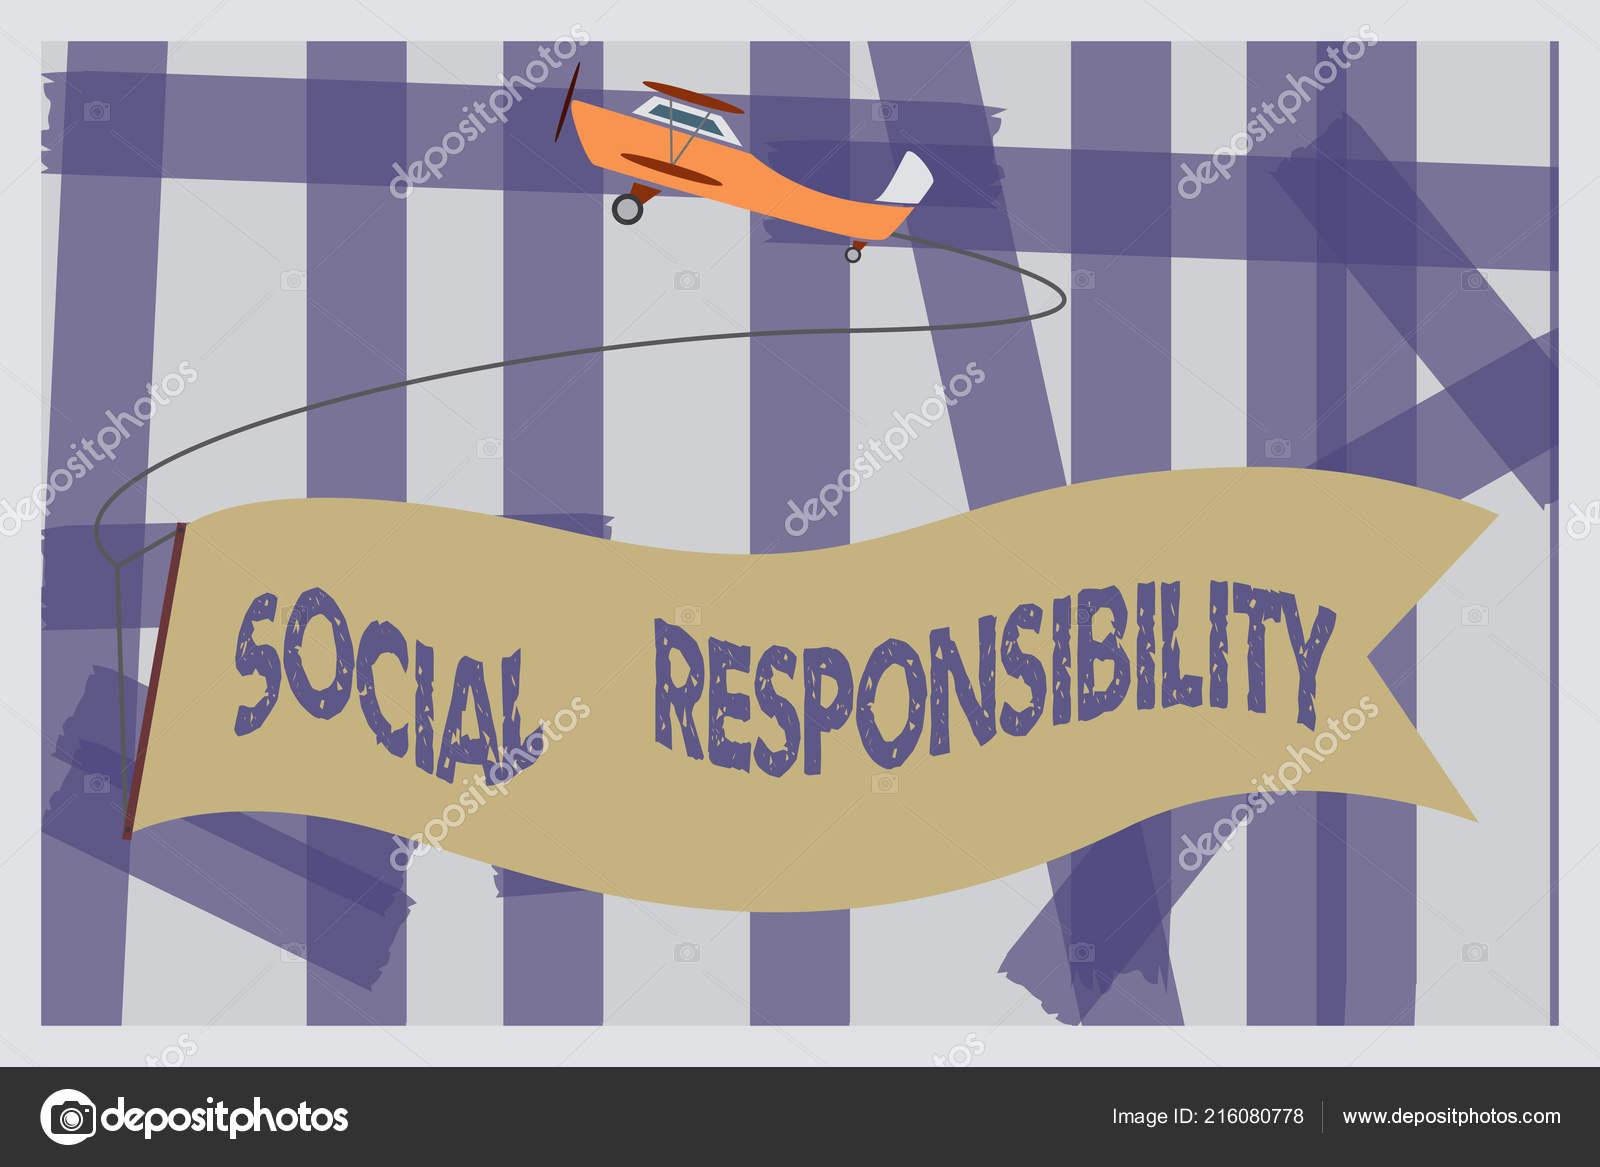 social responsibility of business towards society